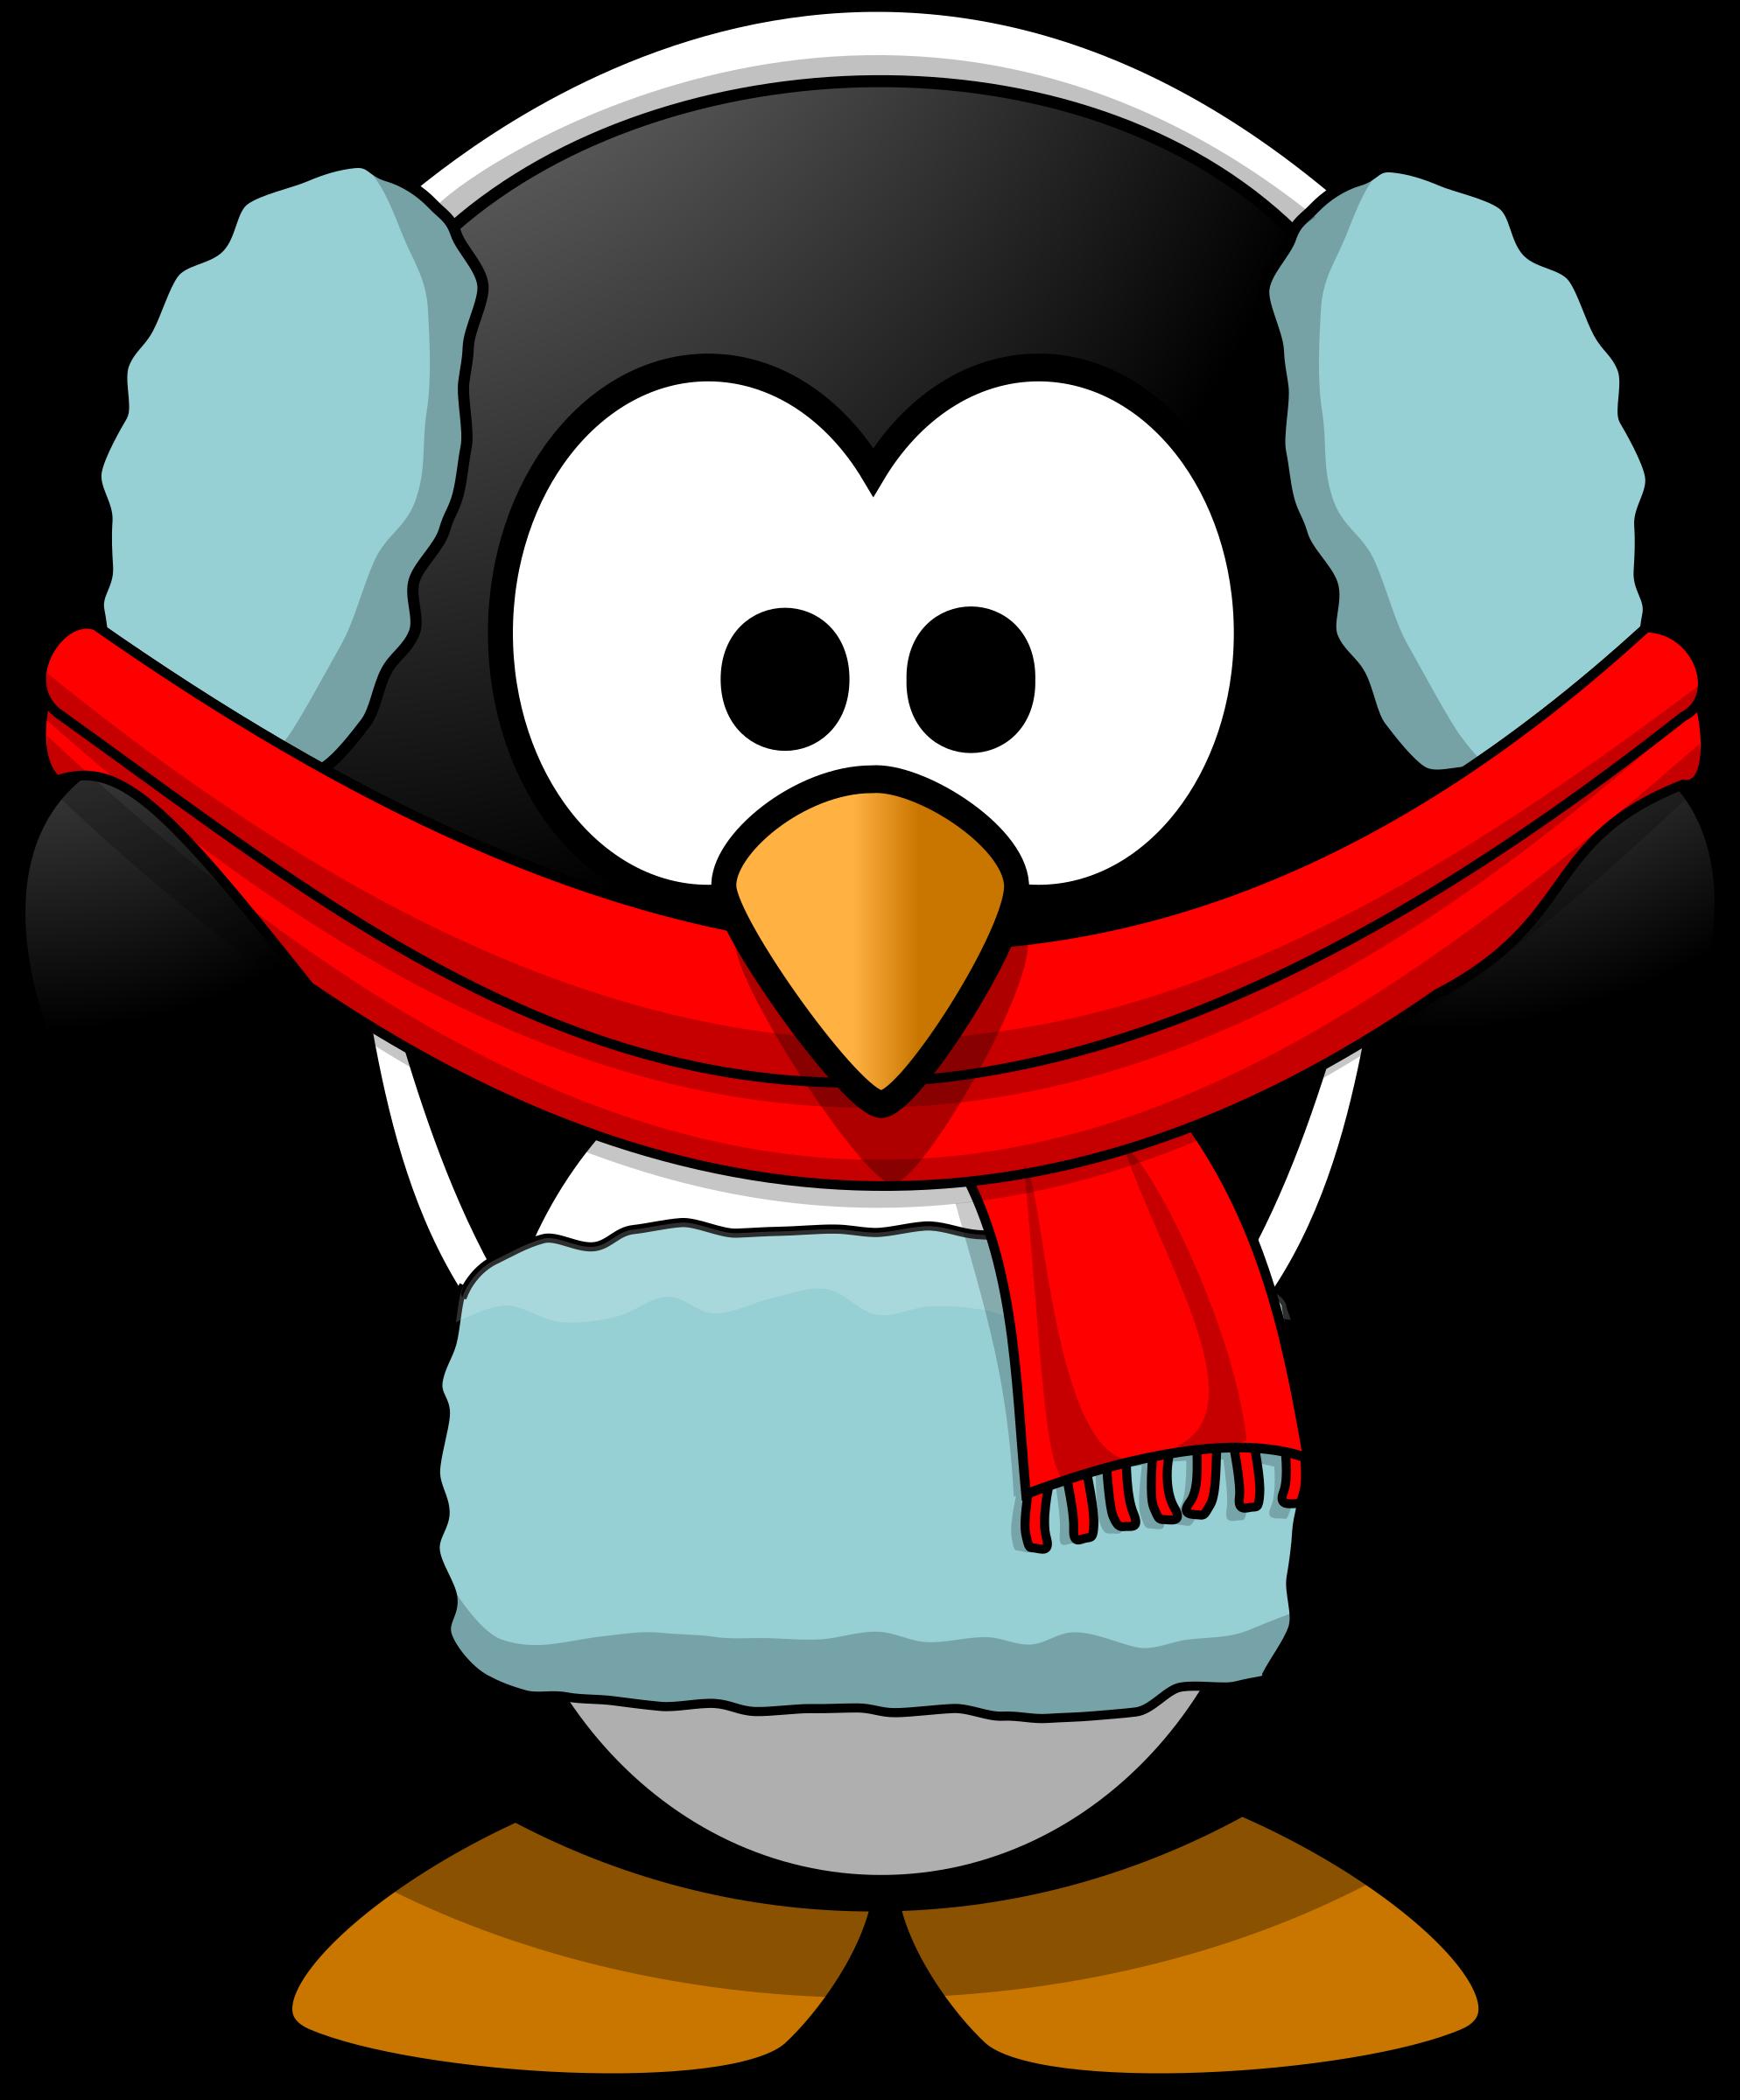 Freezin big image png. Clipart penguin bird